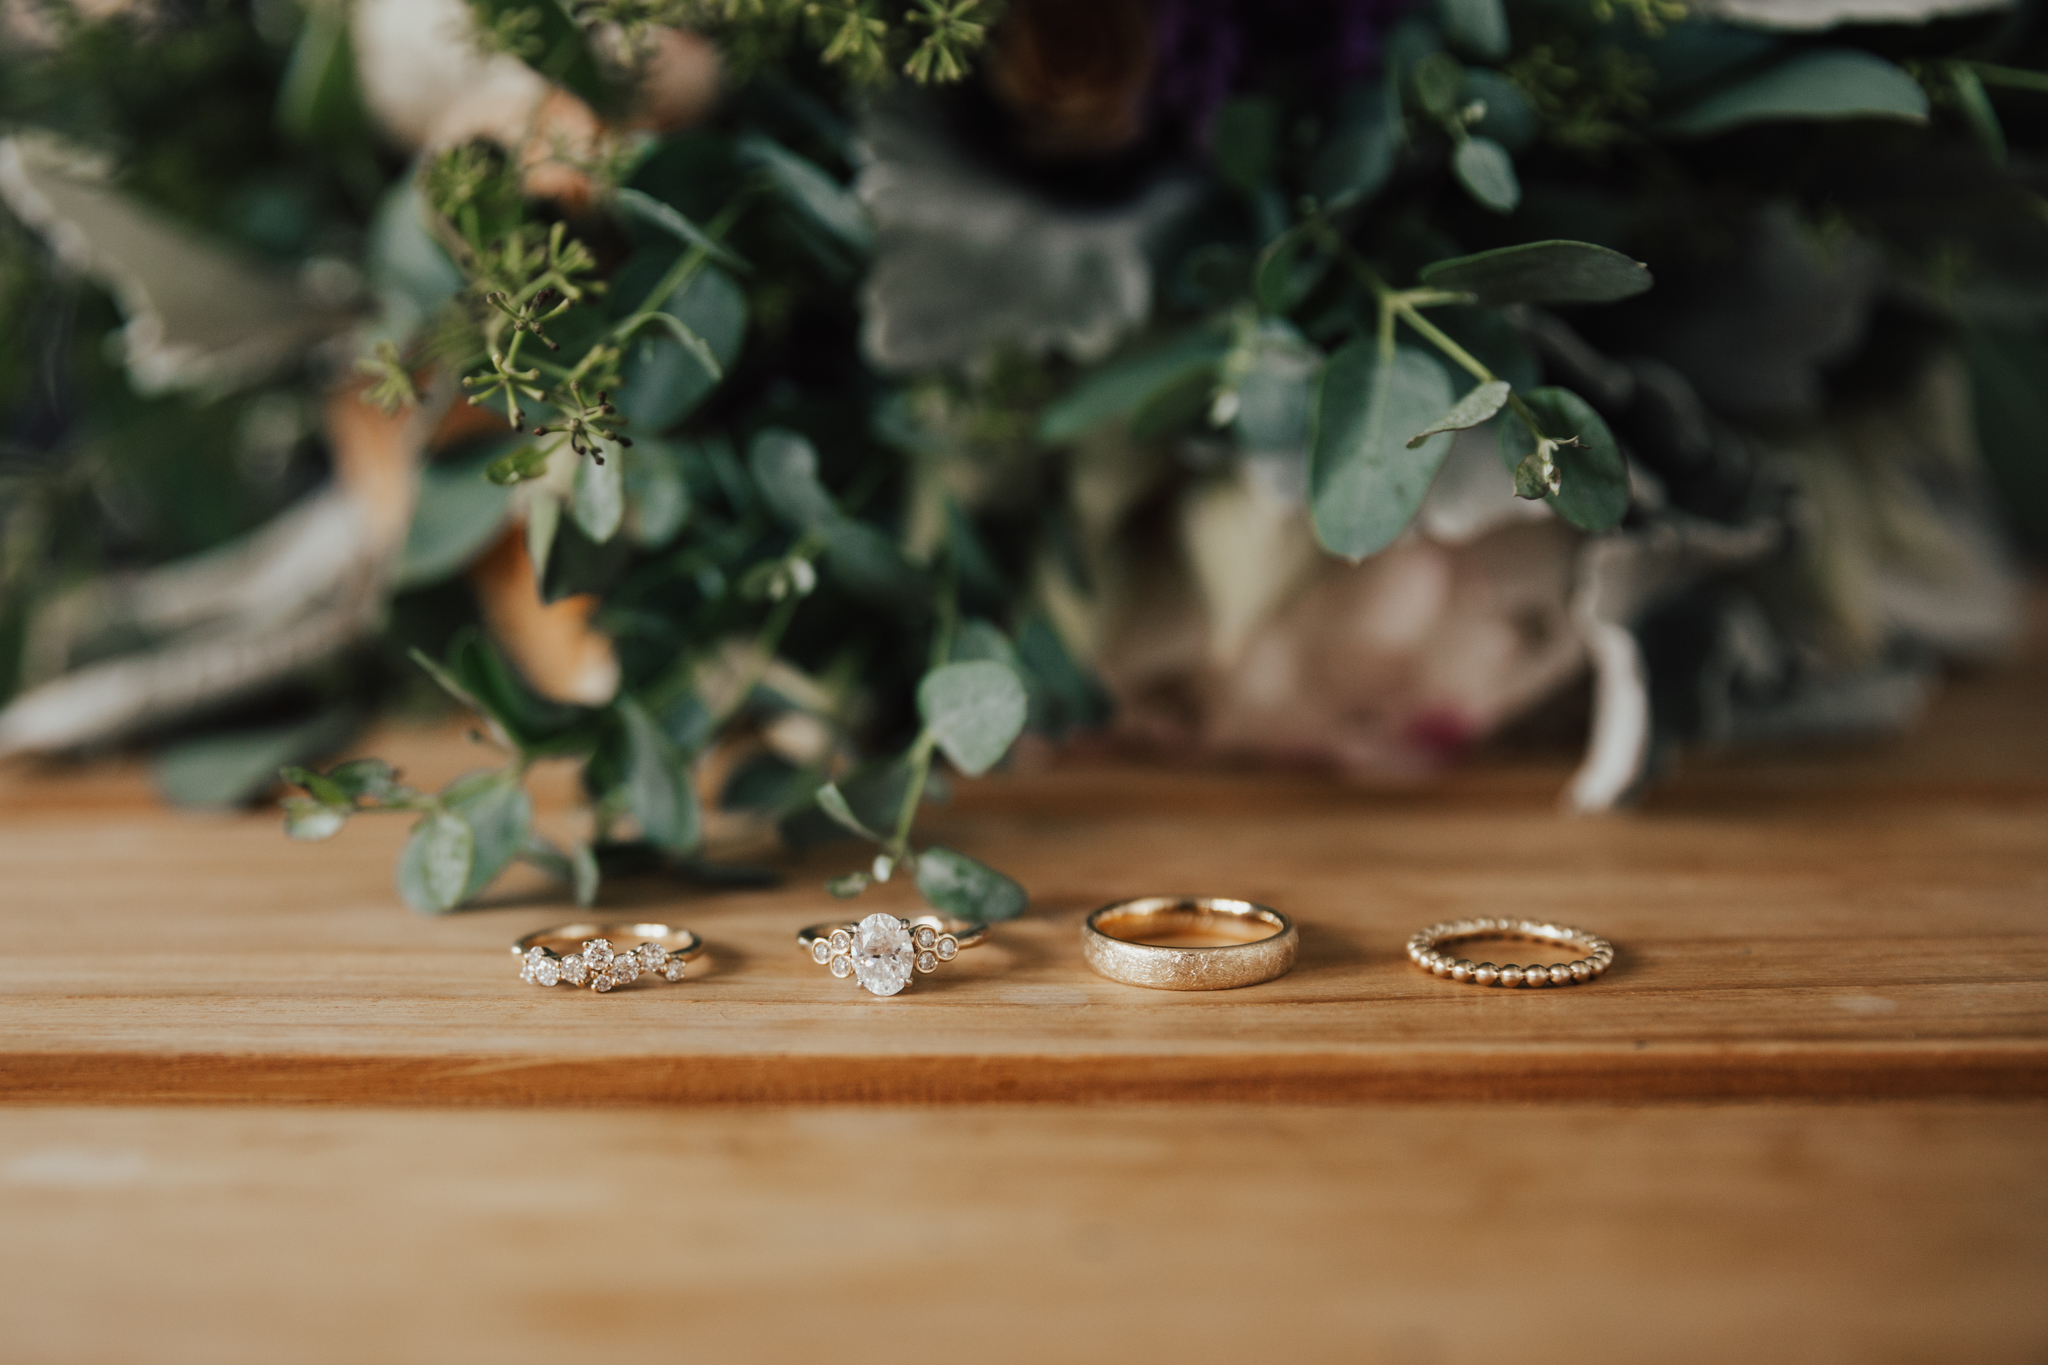 zwikker and zacher wedding ring